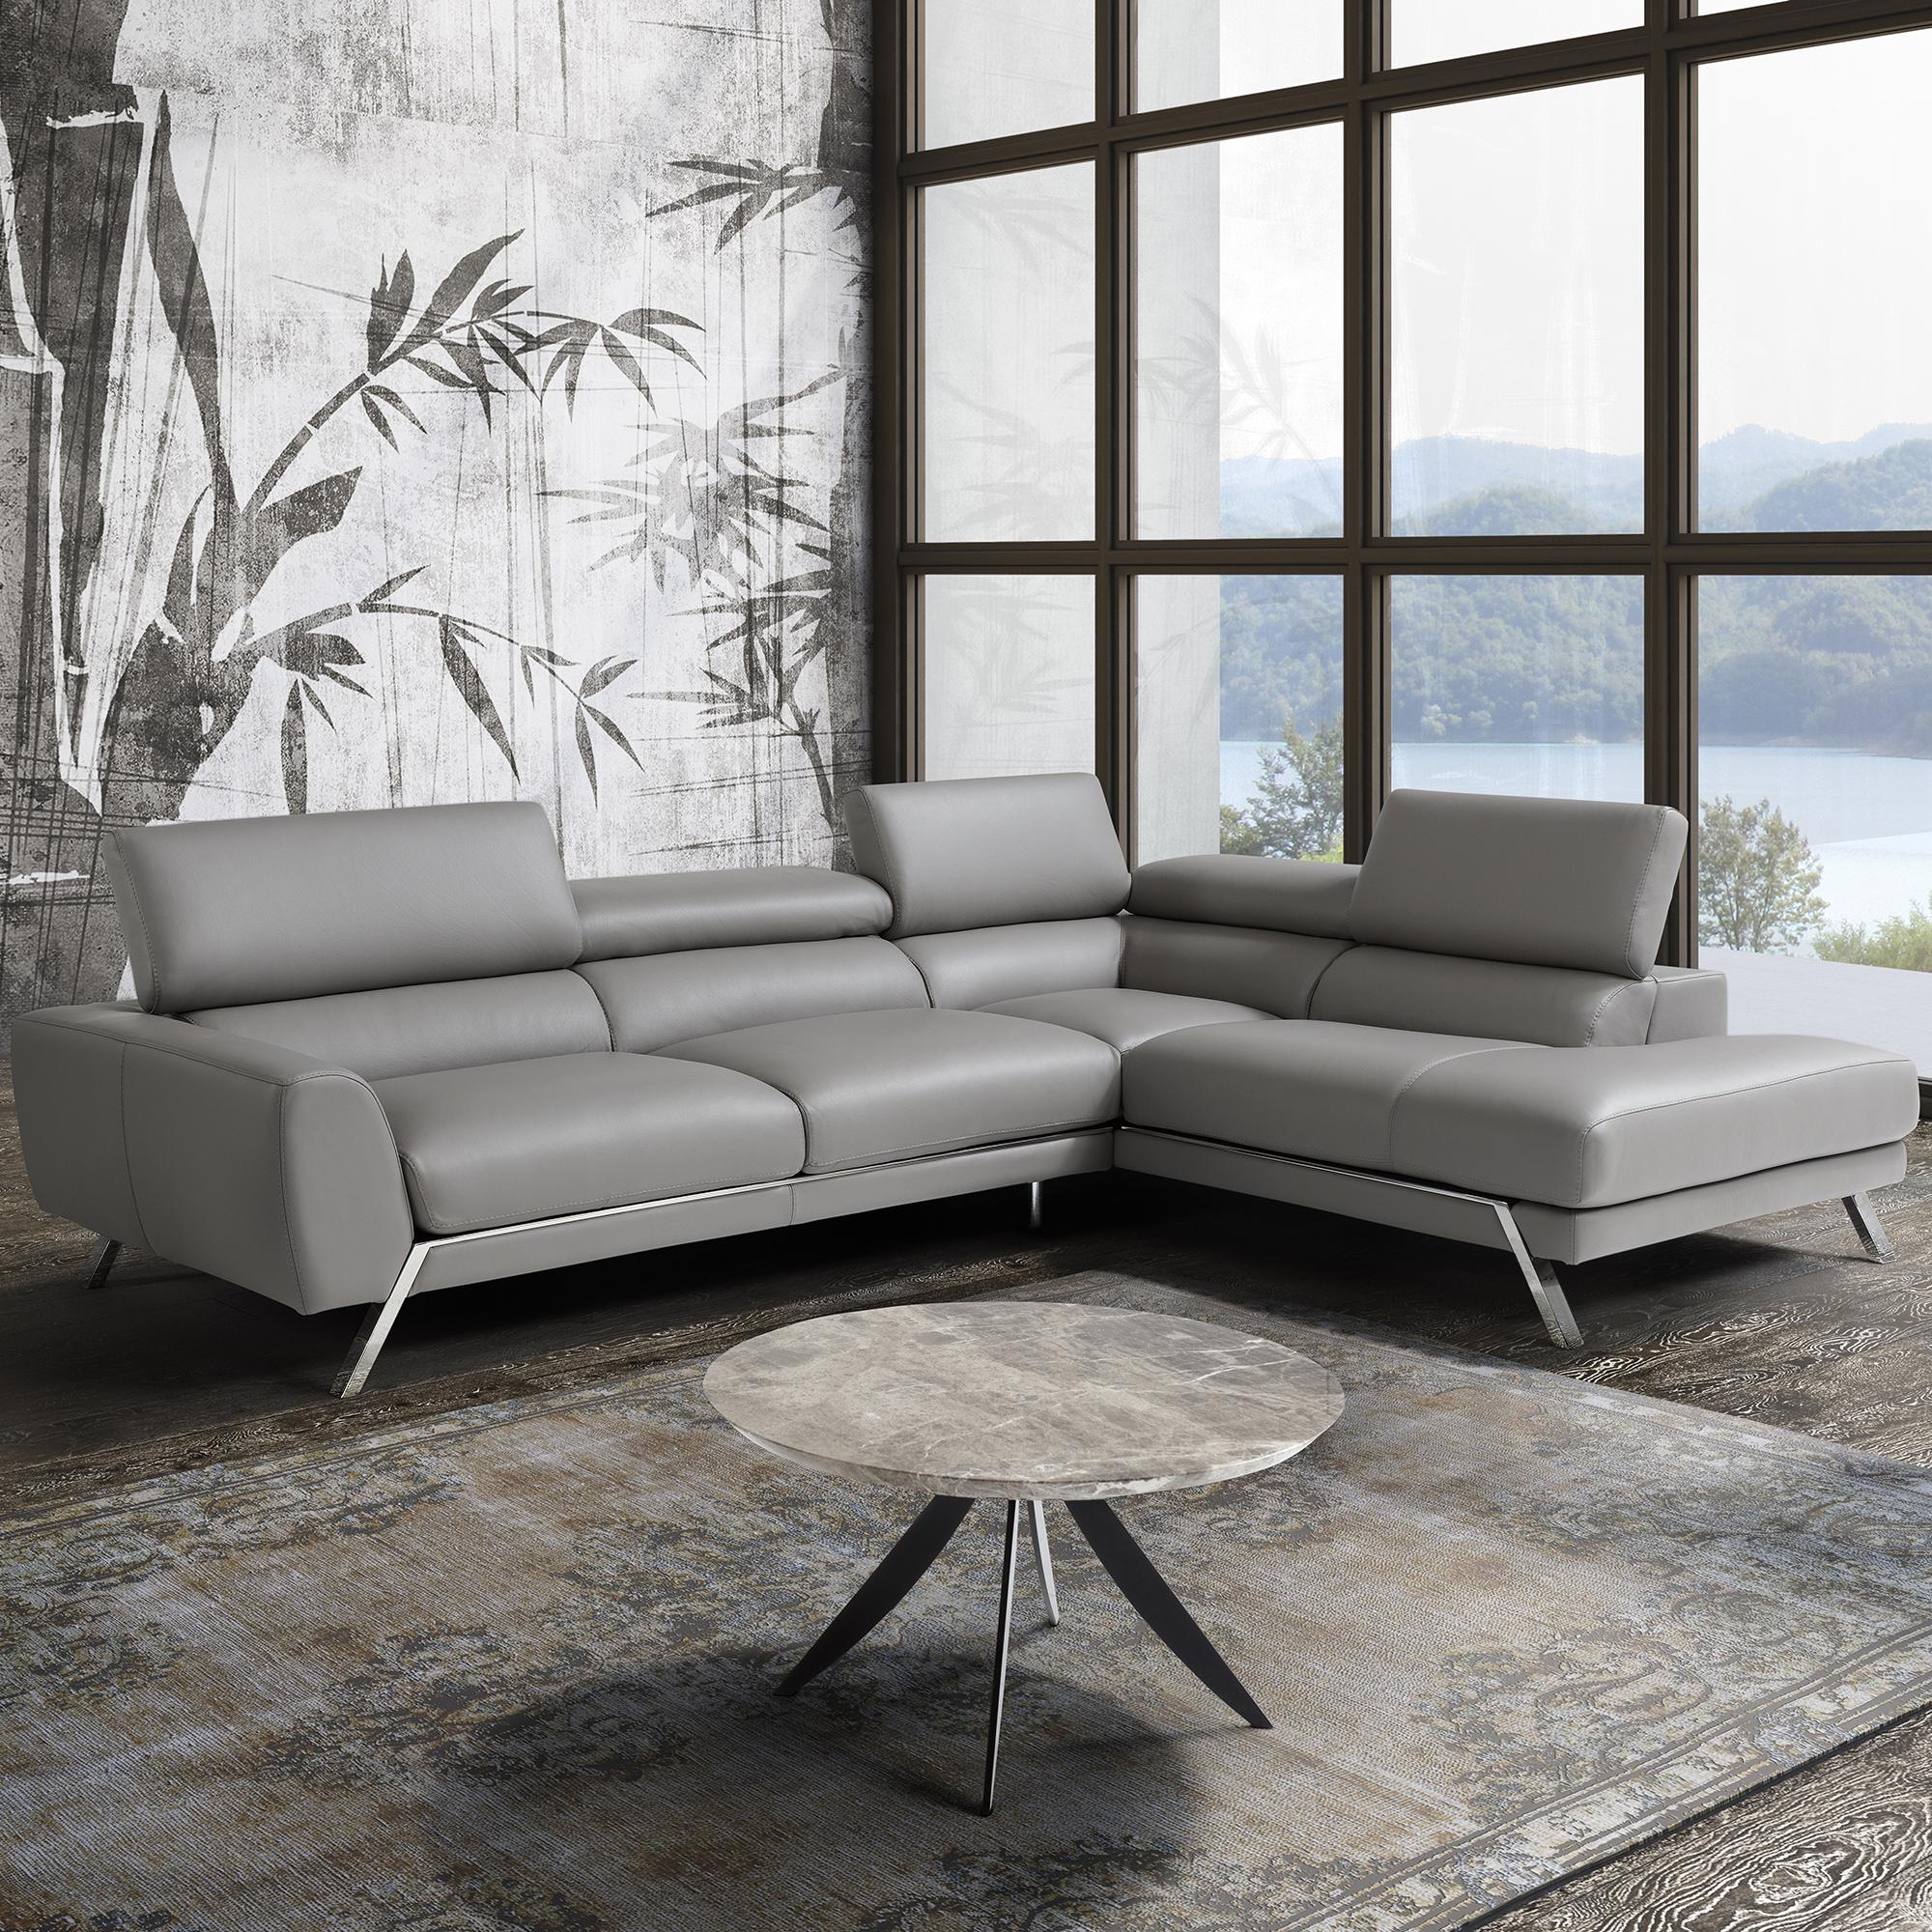 JM Furnishings RHFC Mood Motion Sectional Sofa w Right